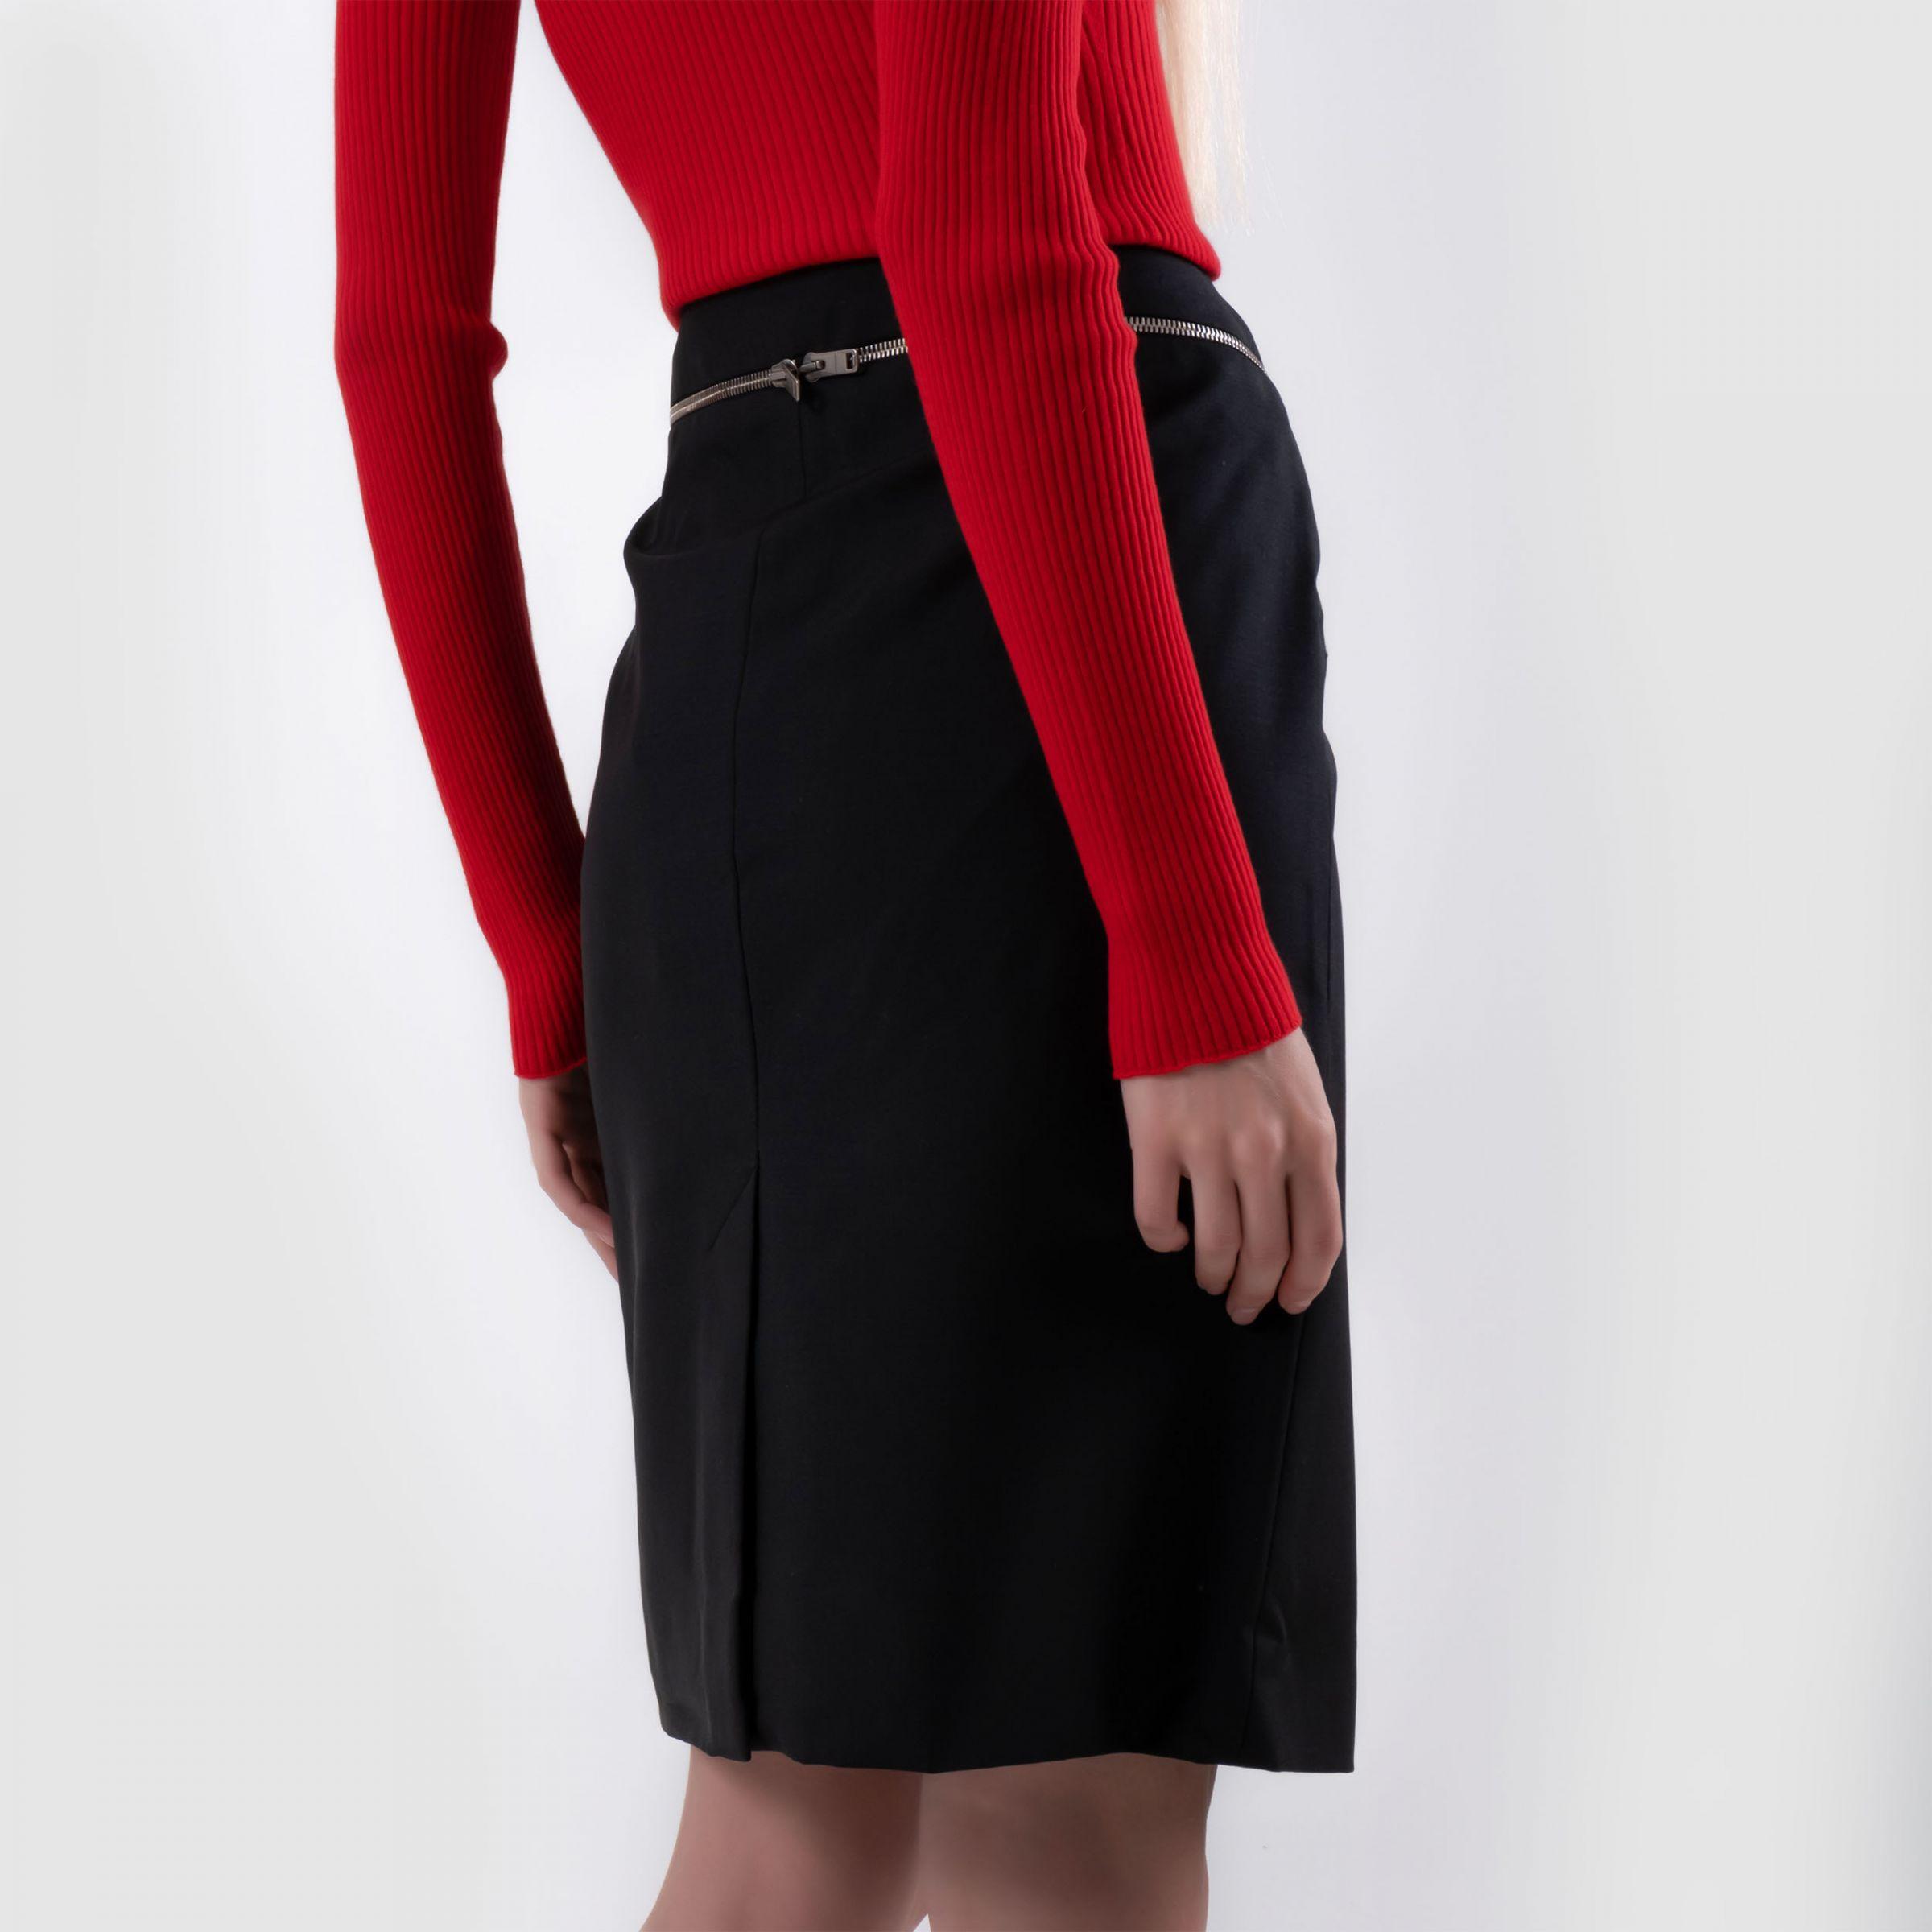 Юбка Givenchy черная